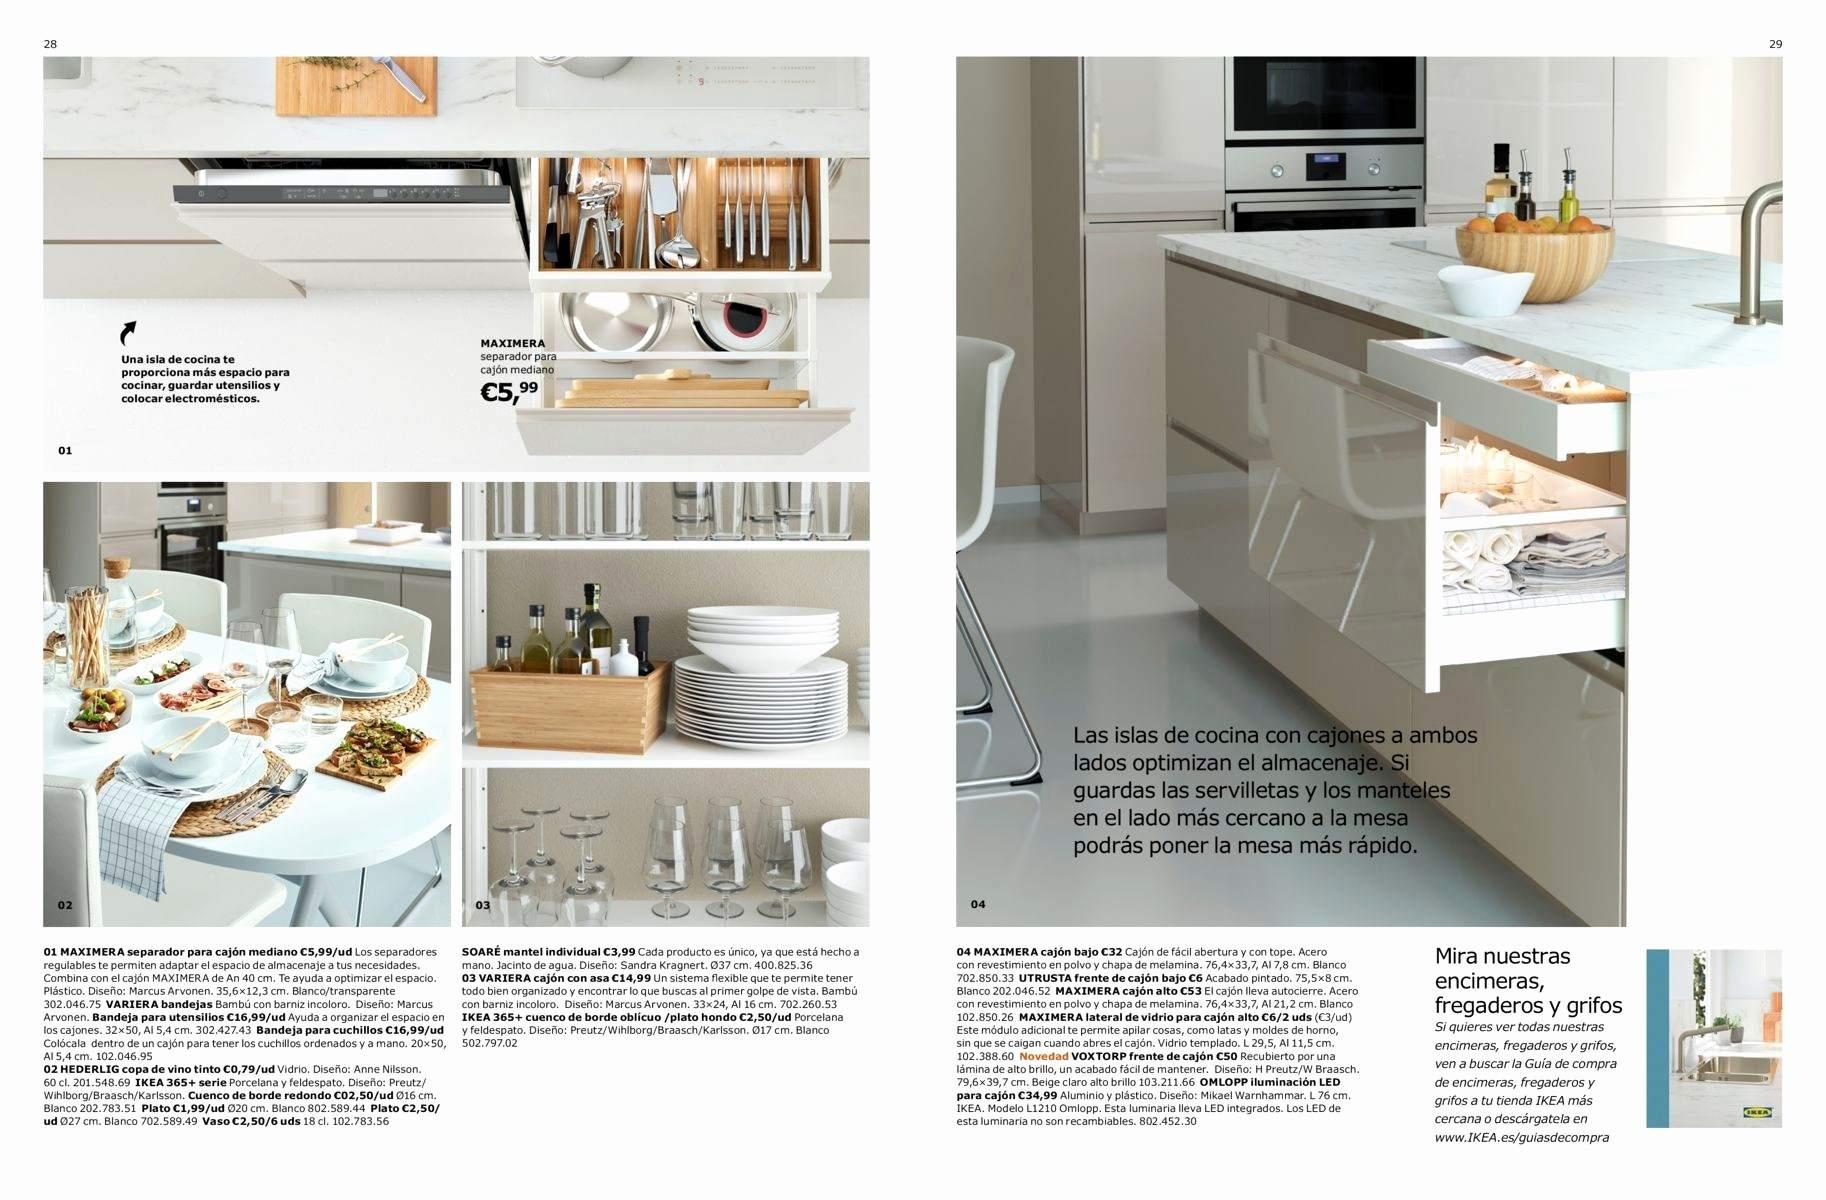 Ikea Cuisine Hittarp Inspirant Photos Ikea Cuisine Plan Travail Luxe 17 Luxe Plan De Travail Quartz Ikea